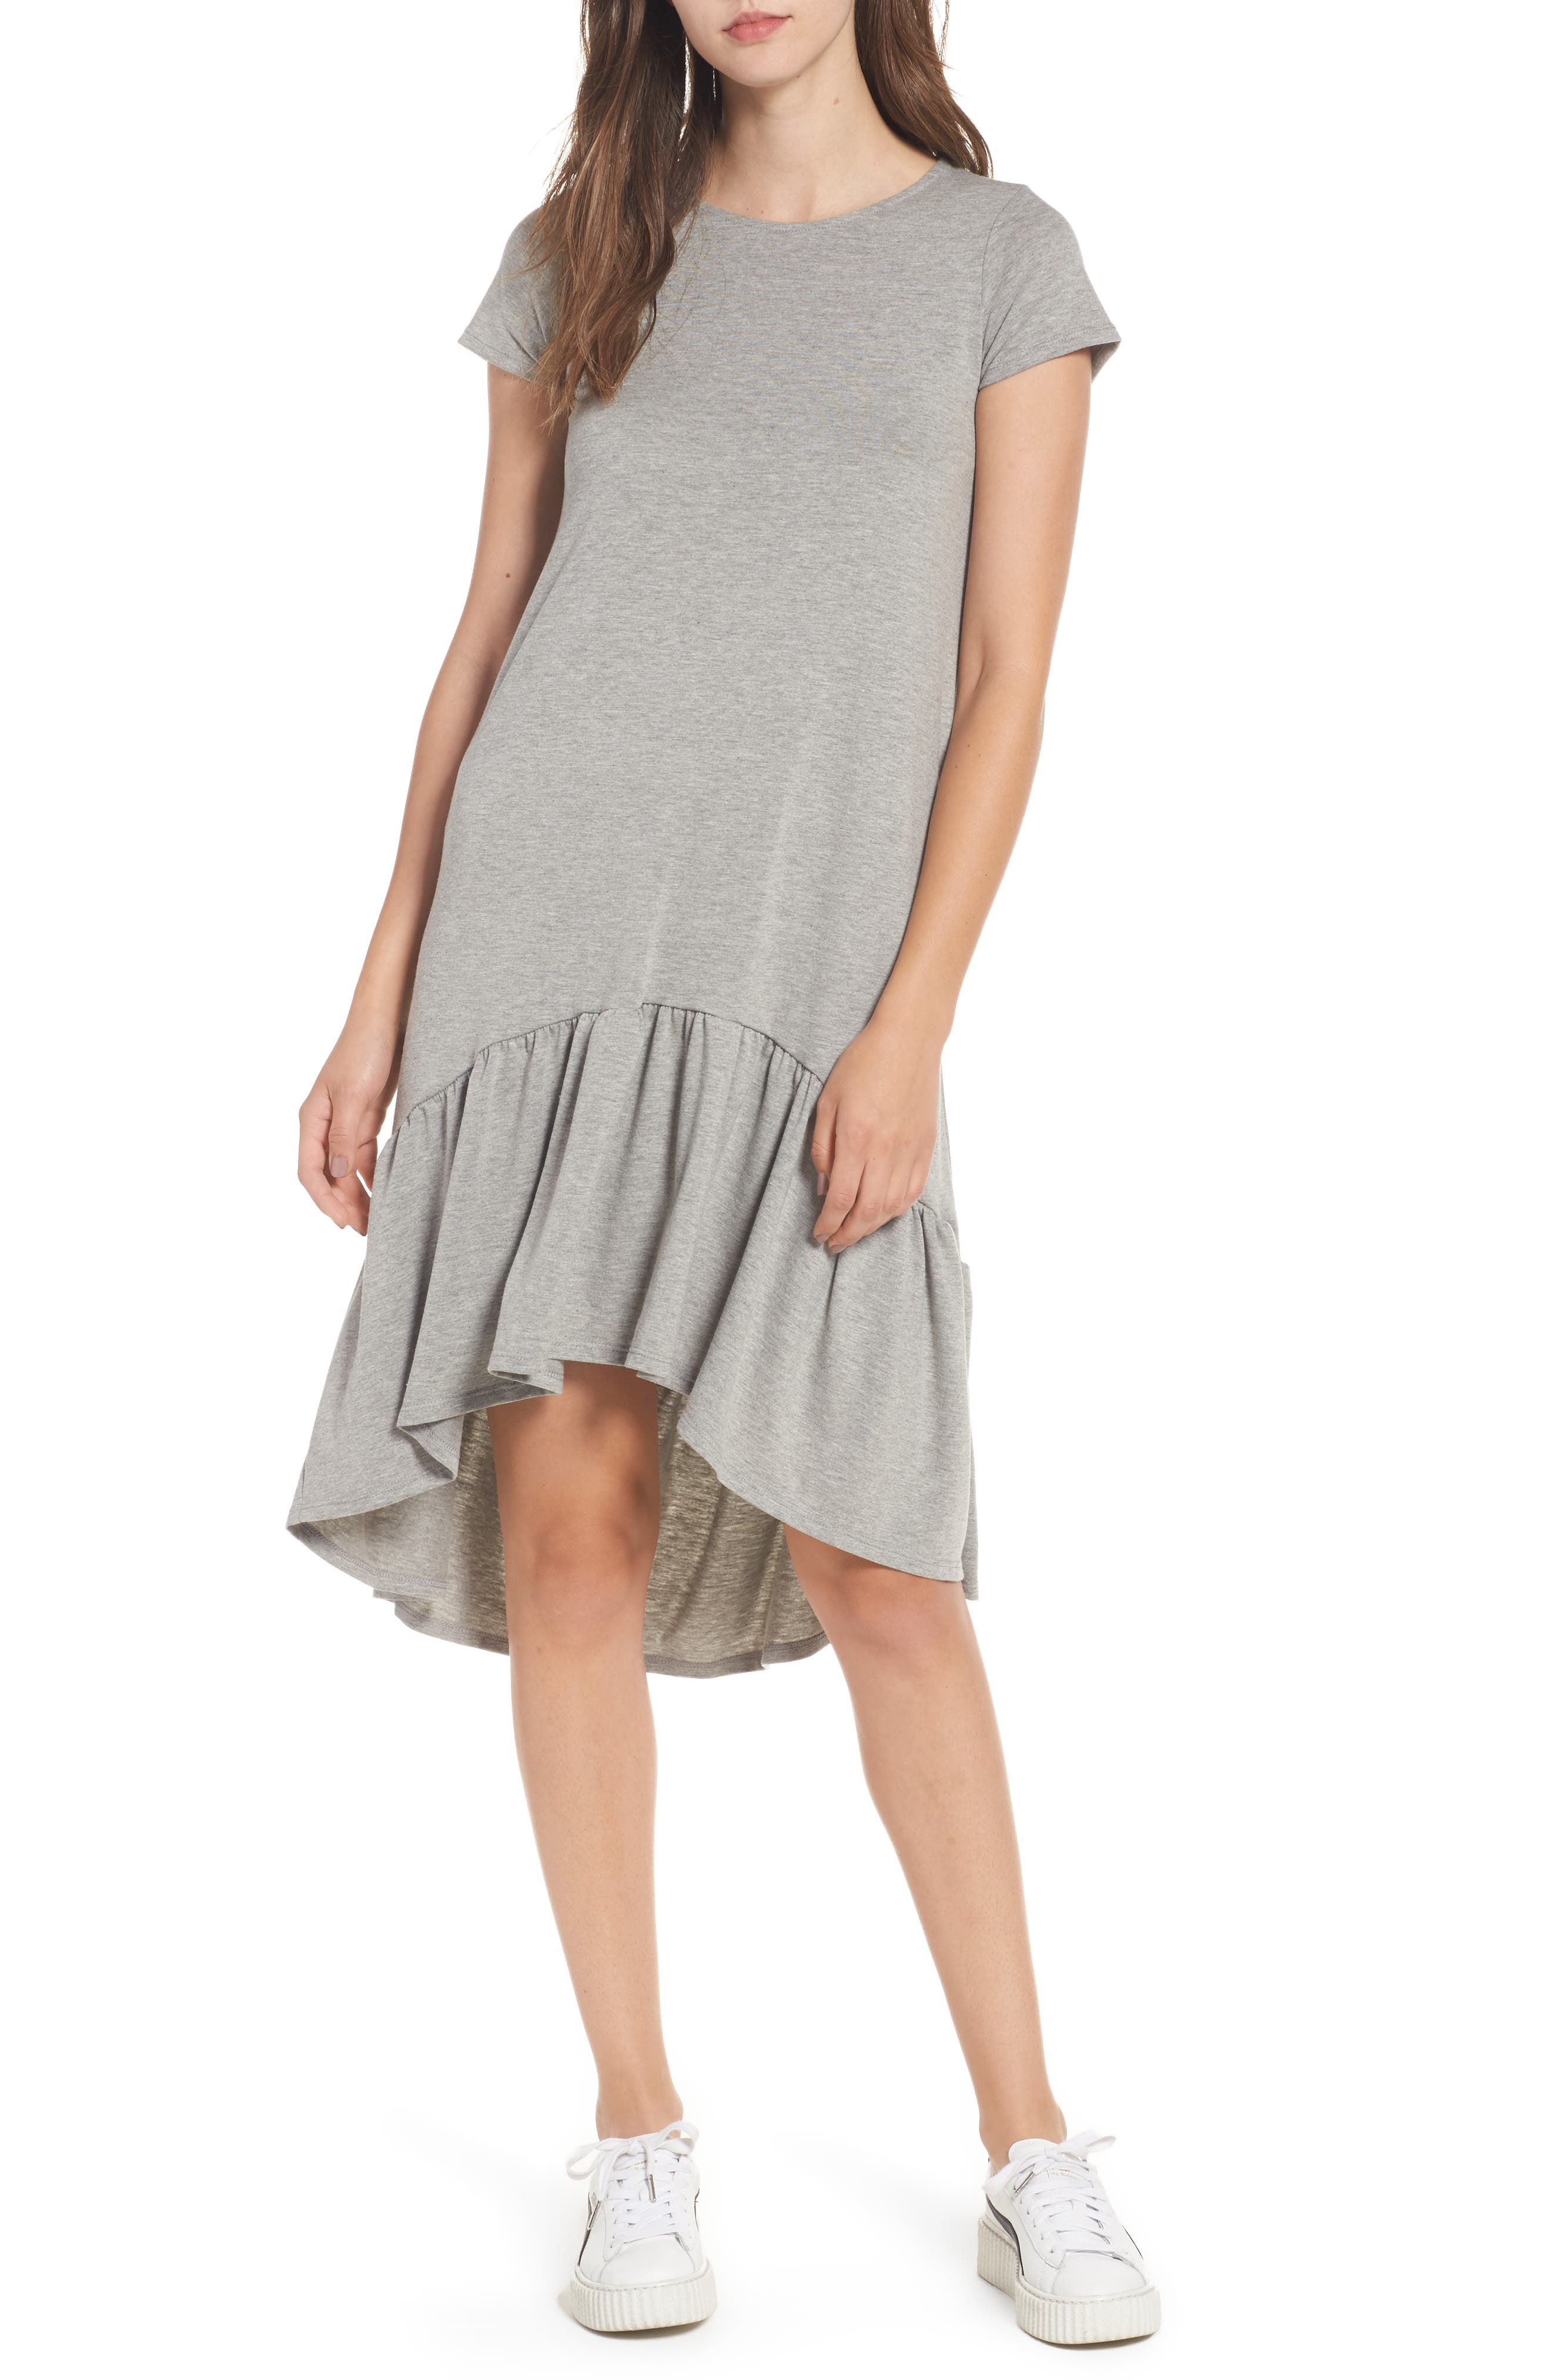 Alternate Image 1 Selected - Cotton Emporium Ruffle Hem Knit T-Shirt Dress